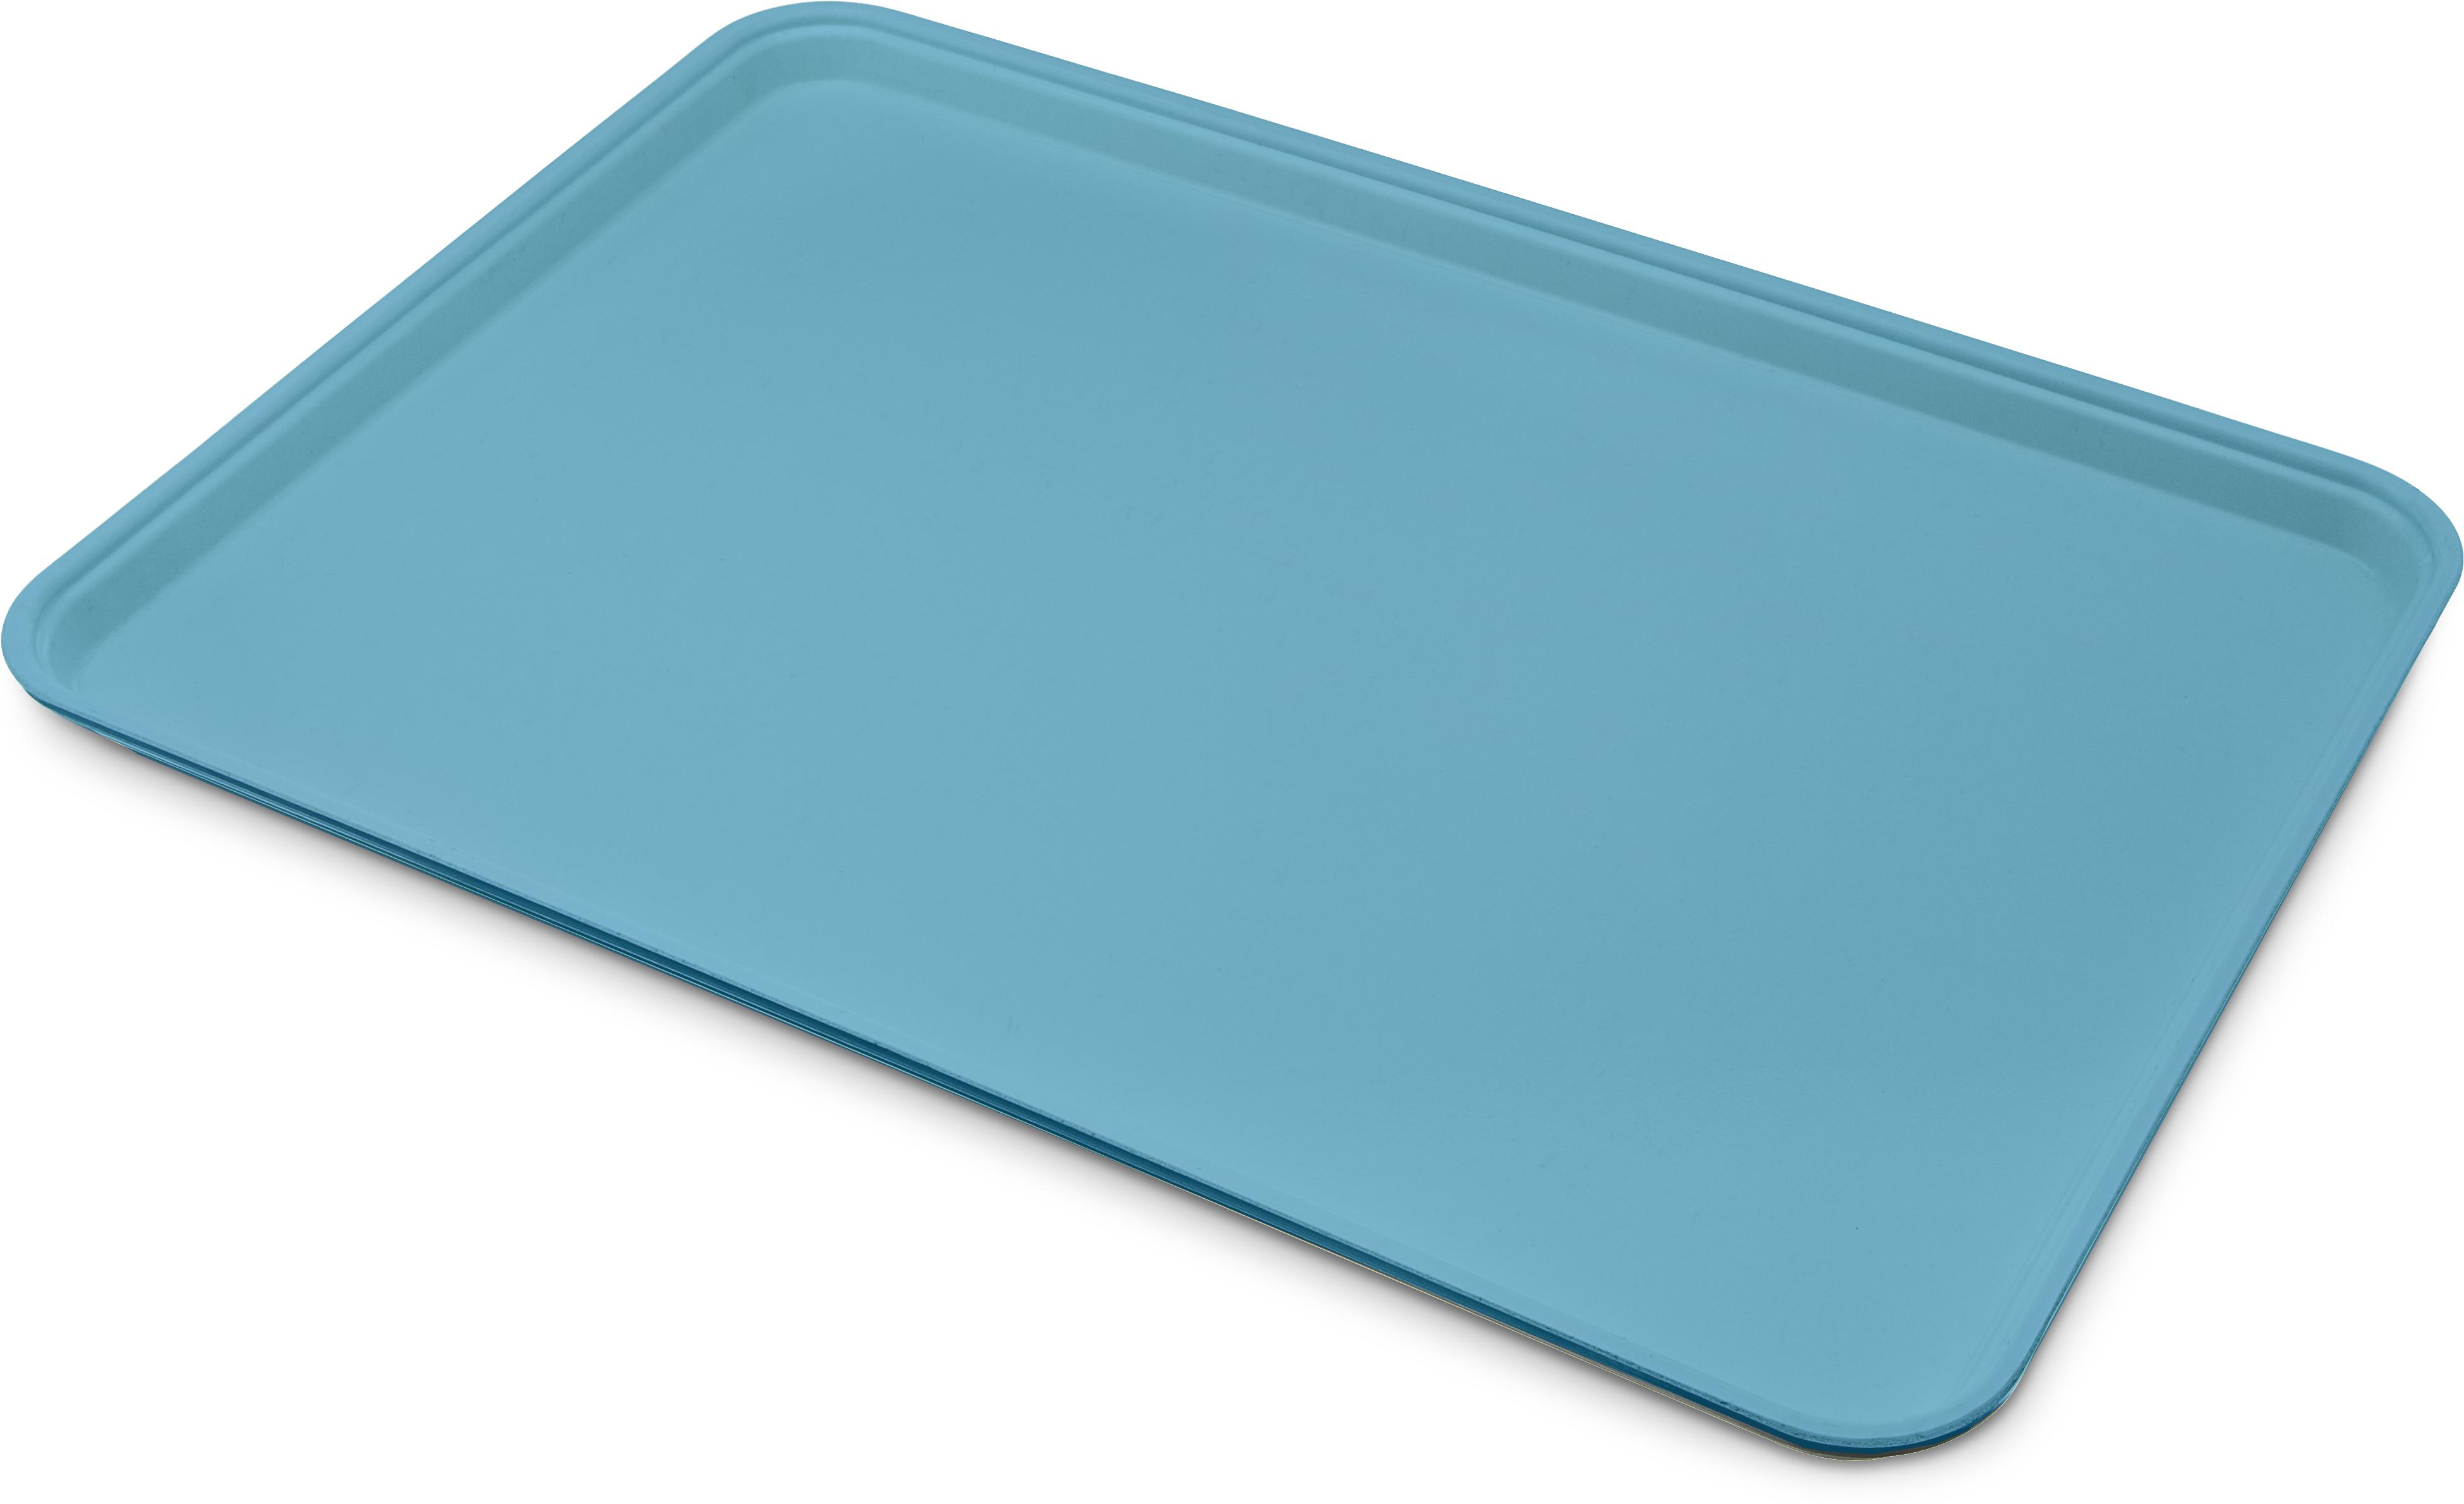 Glasteel Tray Display/Bakery 17.9 x 25.6 - Ice Blue